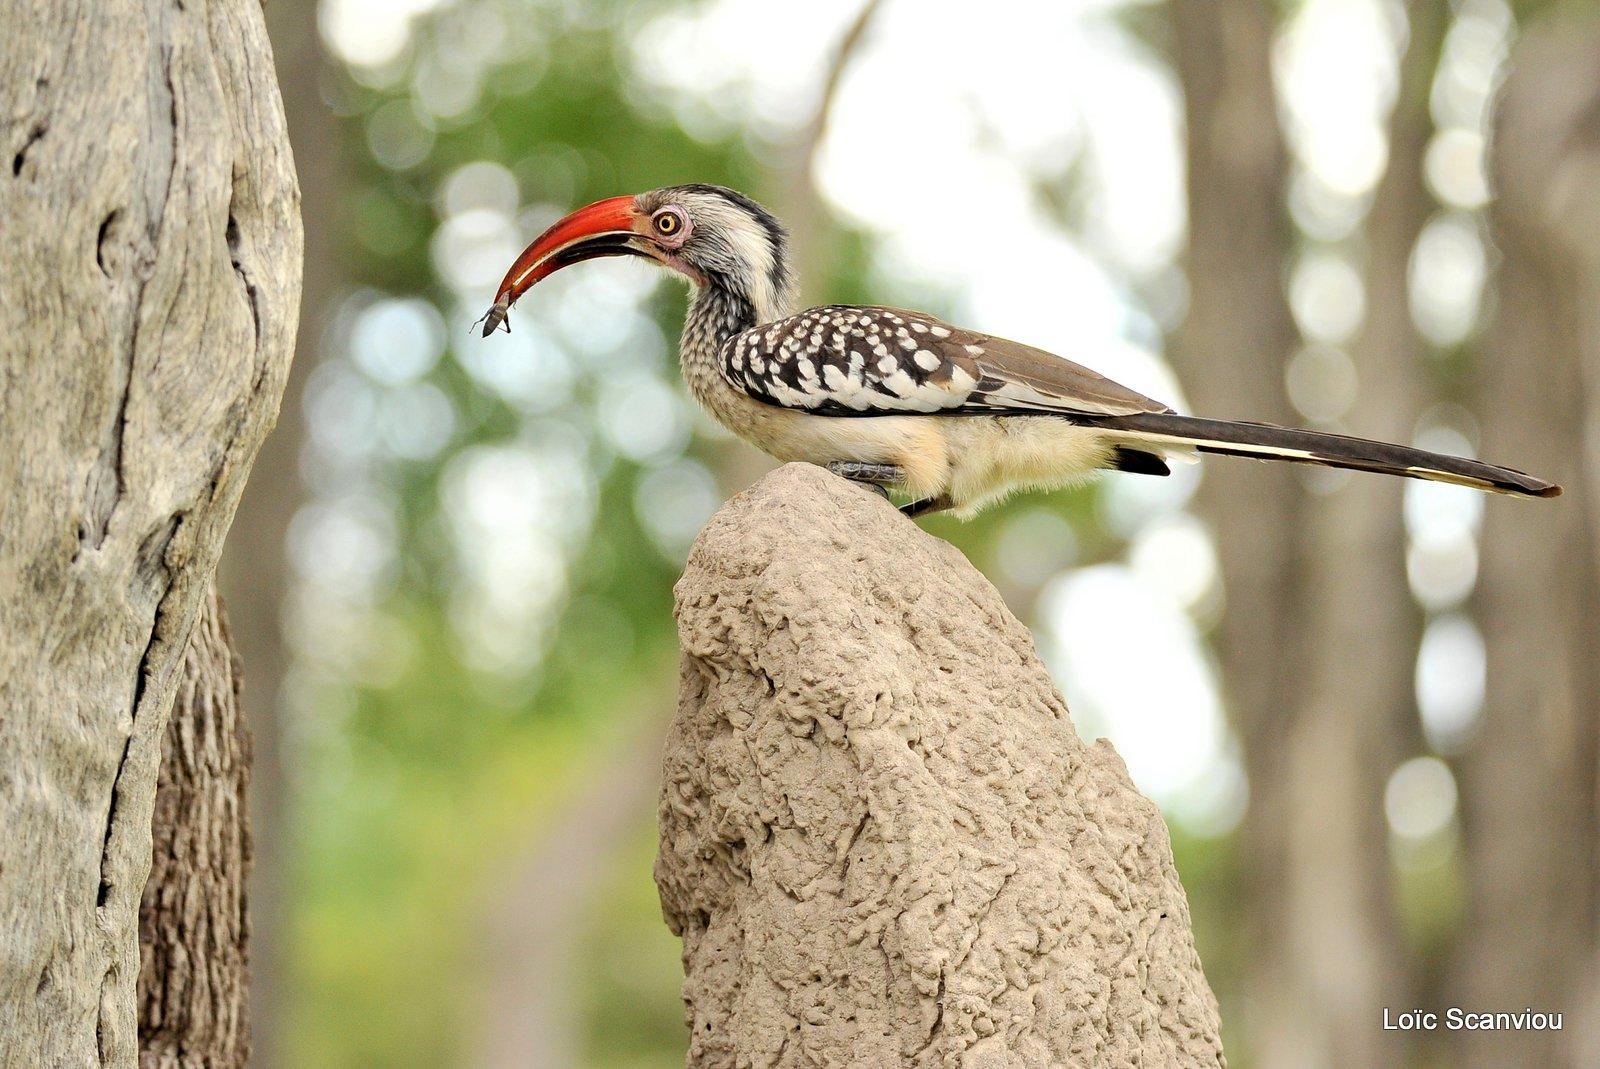 Calao à bec rouge/Red-billed Hornbill (2)